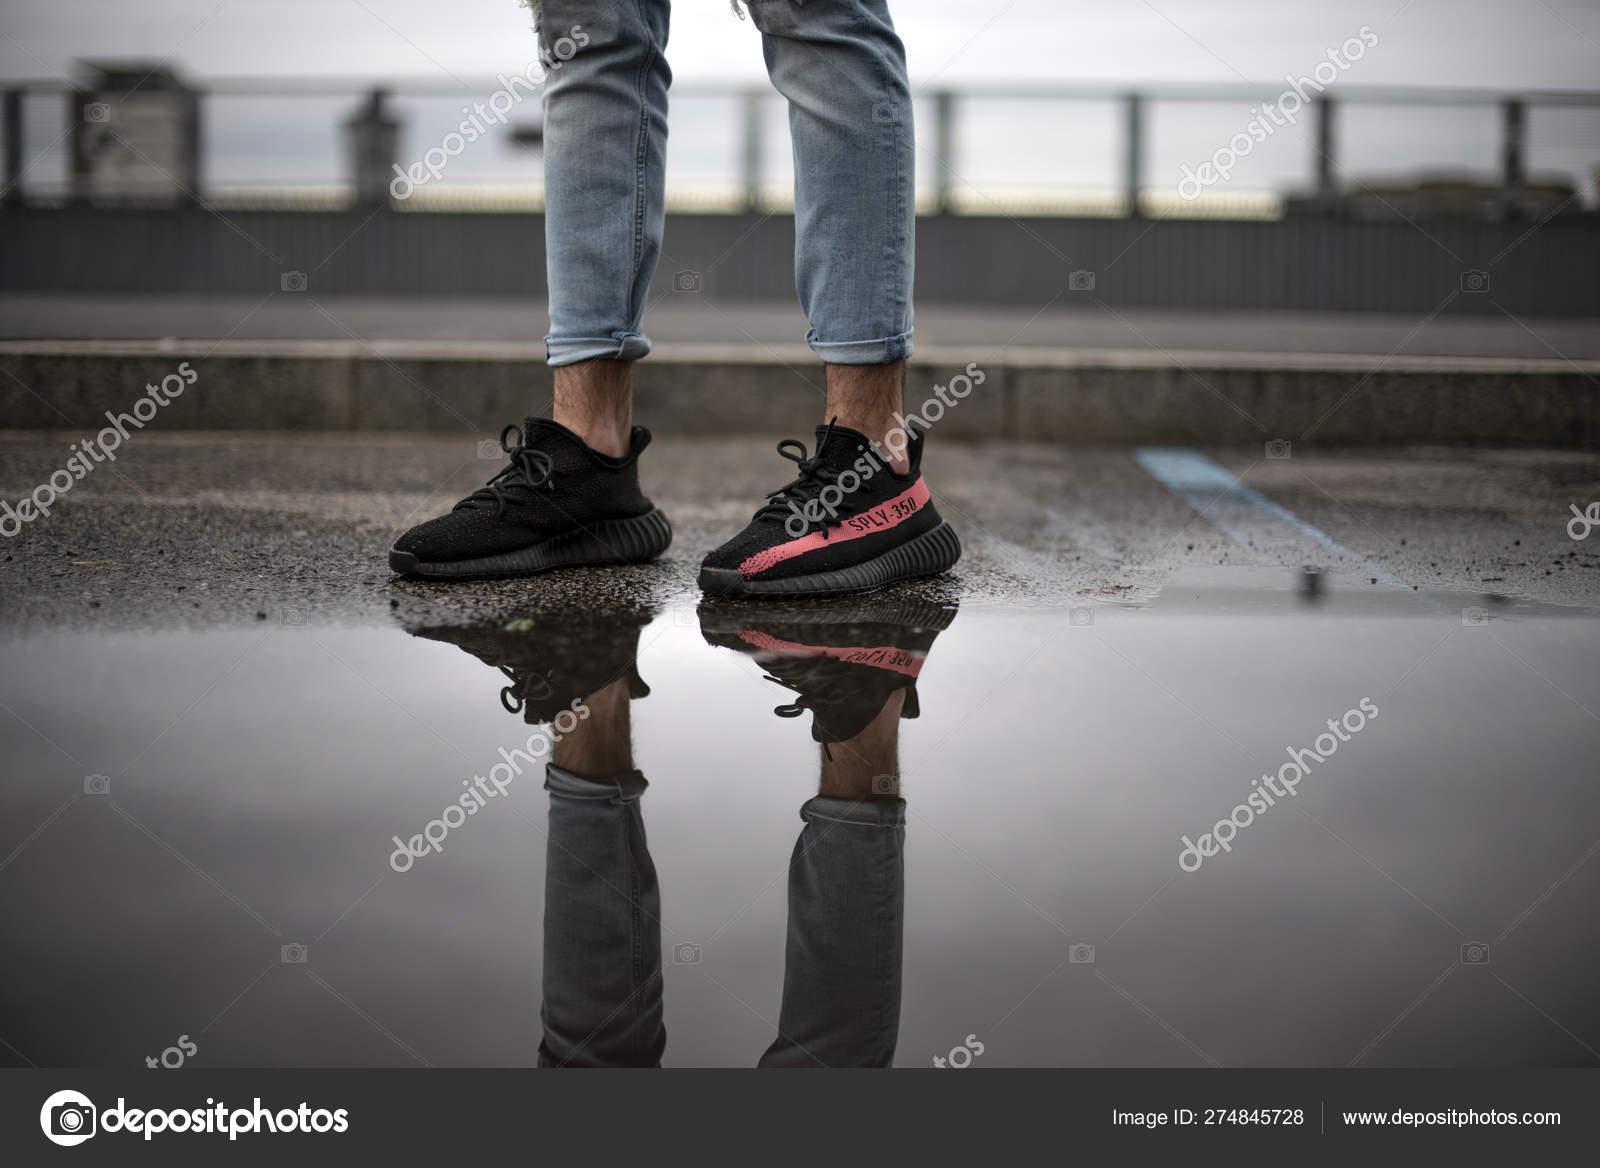 Adidas Yeezy 350 – Stock Editorial Photo © Albo73 #274845728